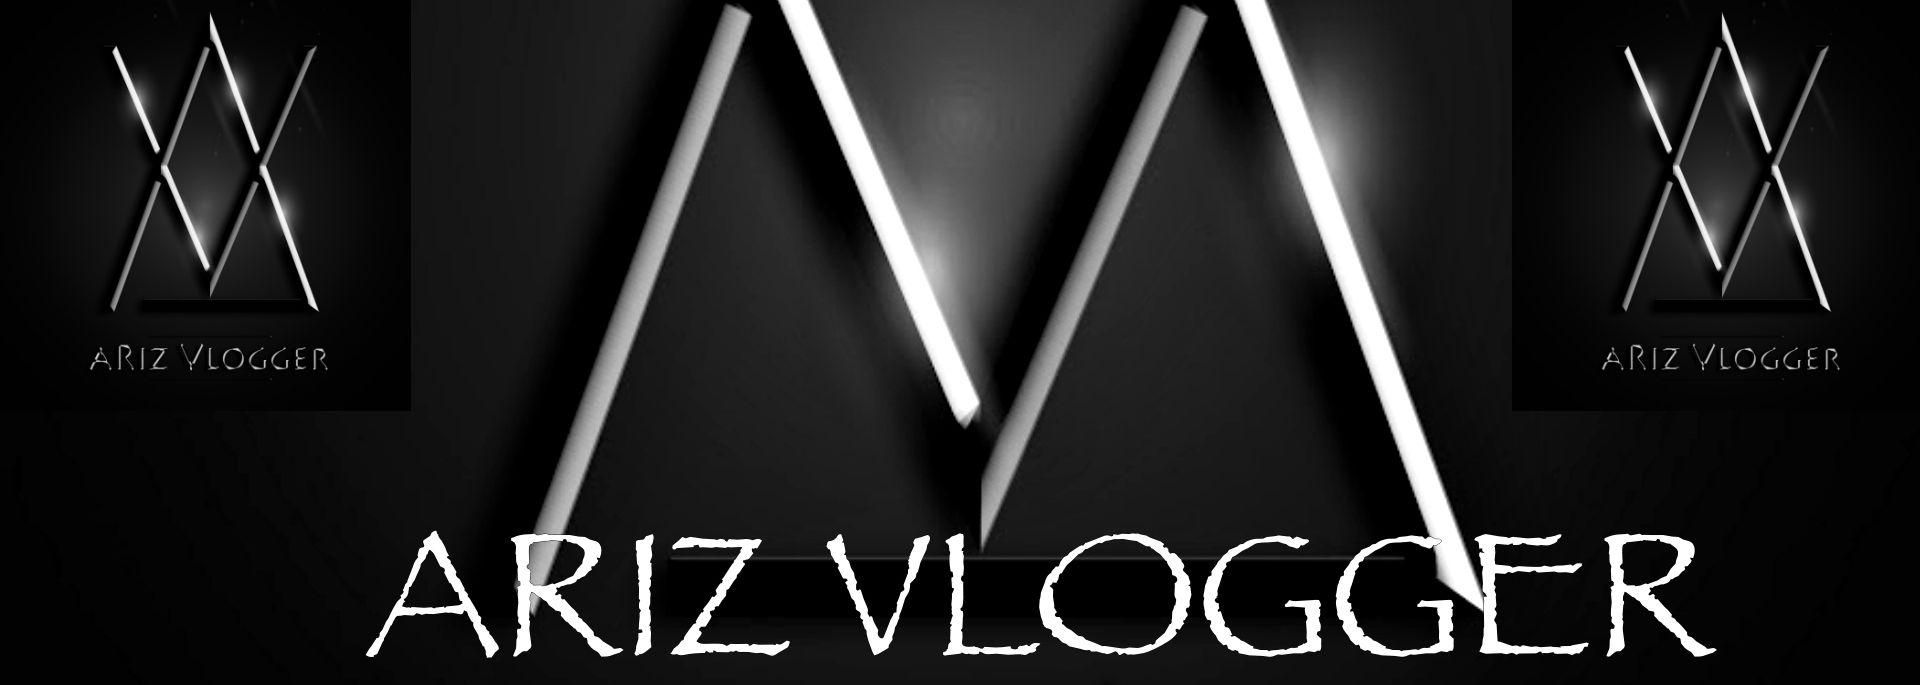 Ariz Vlogger channel